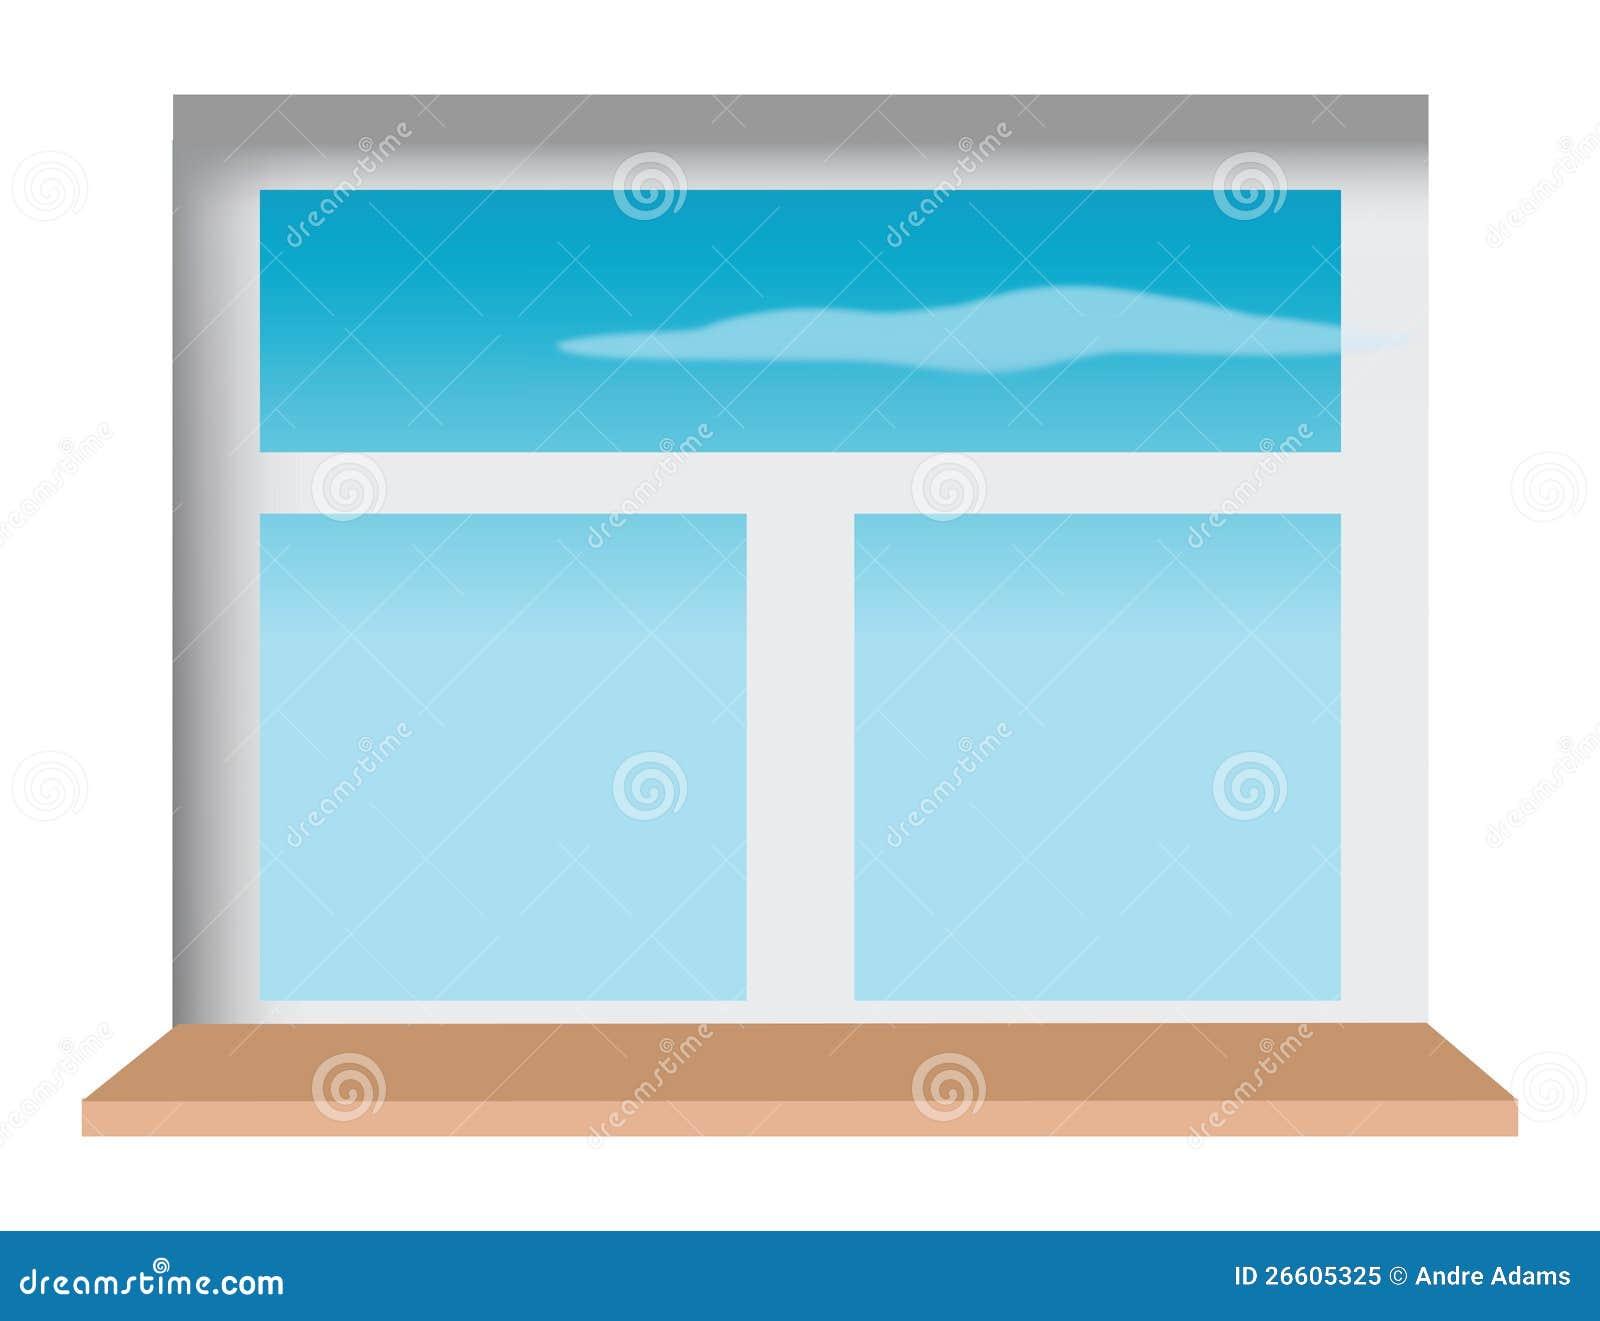 Window Sill Royalty Free Stock Image